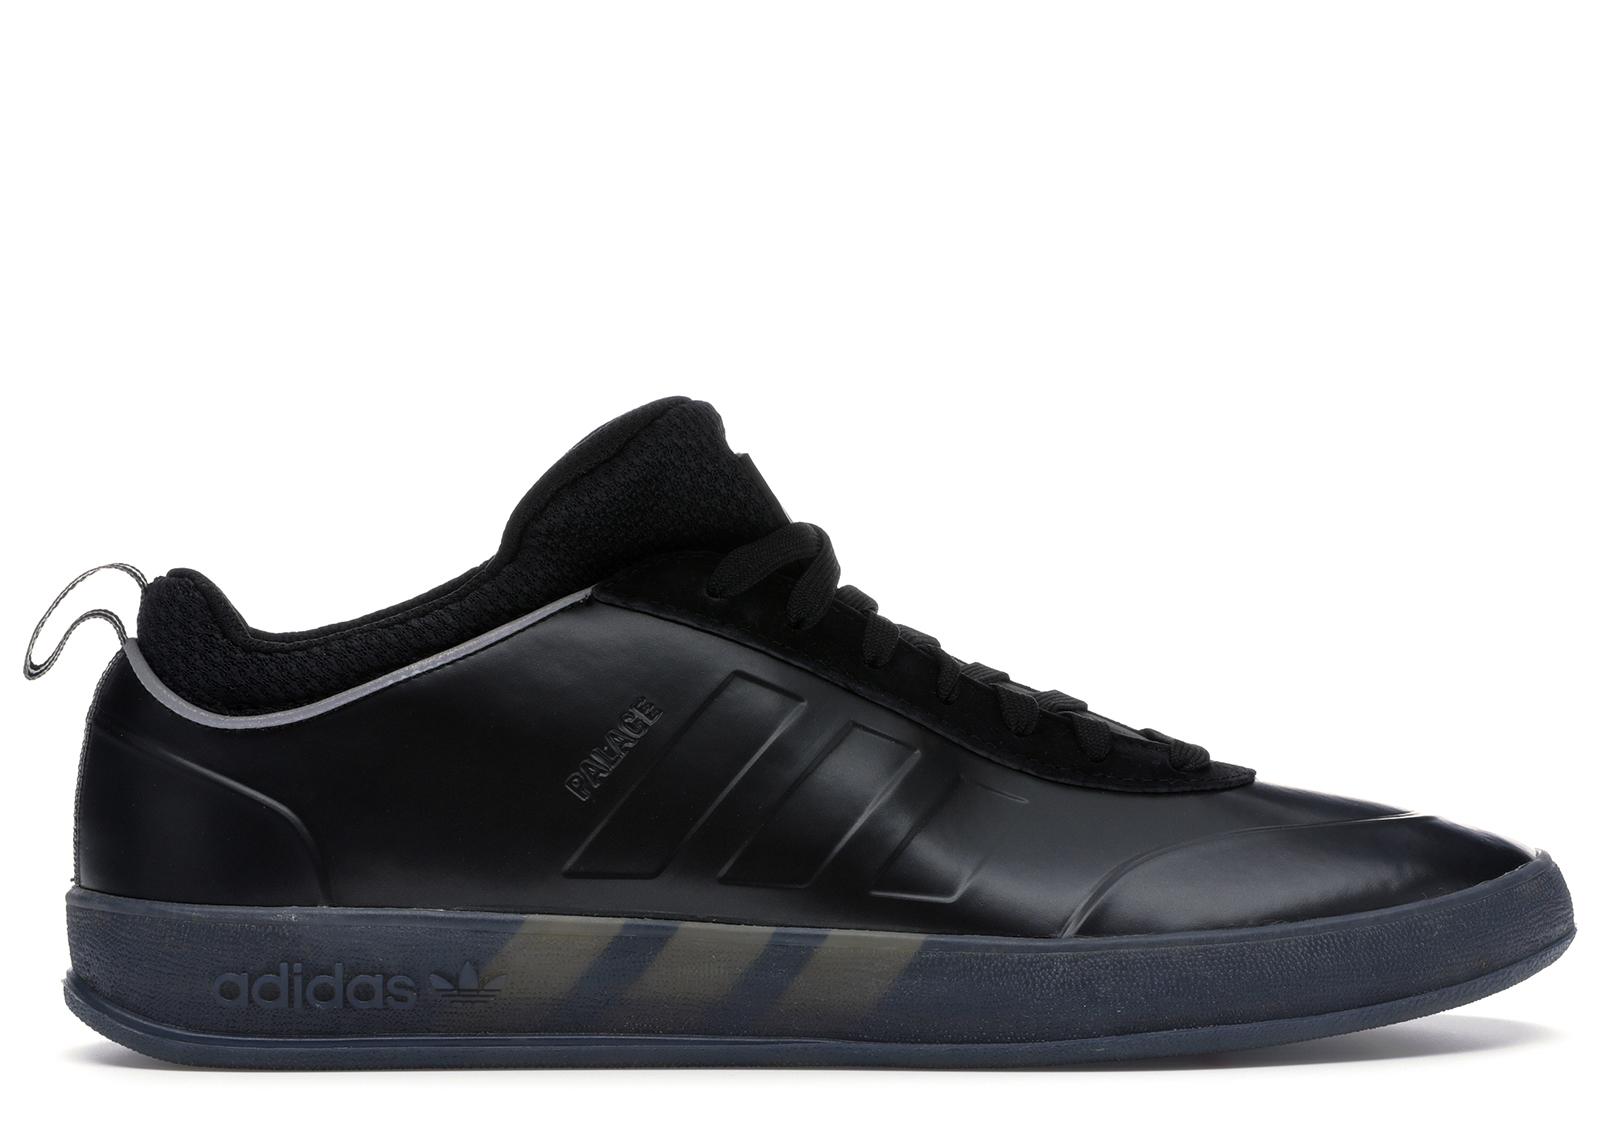 adidas Palace Pro 2 Black - CM7369